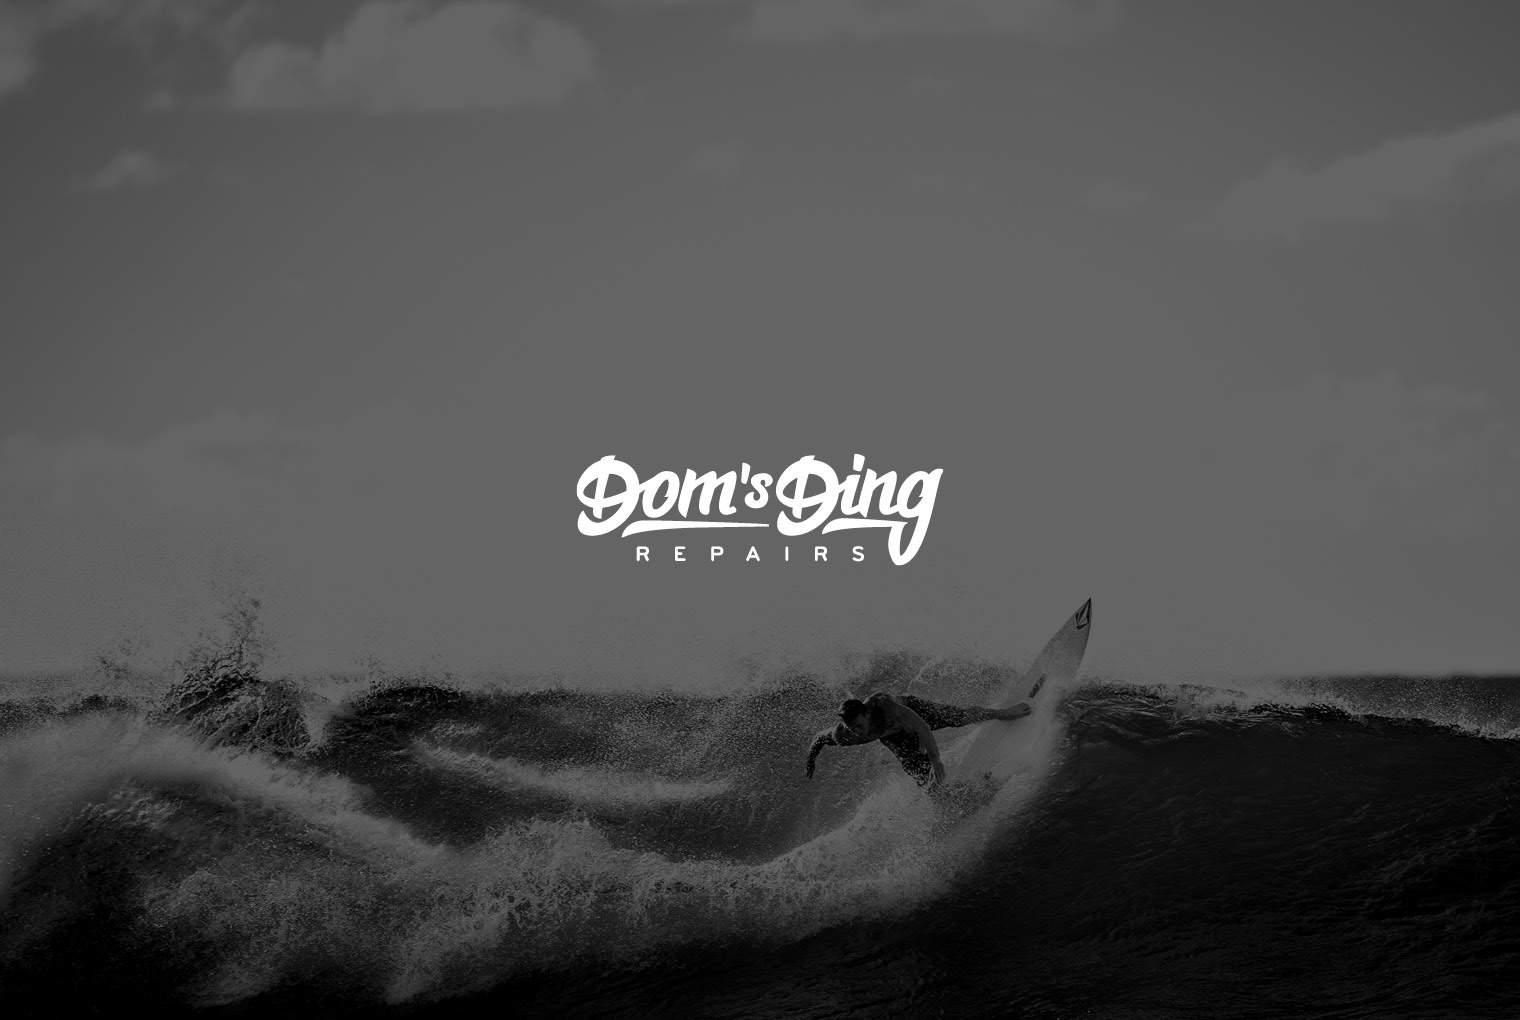 DomsDing5